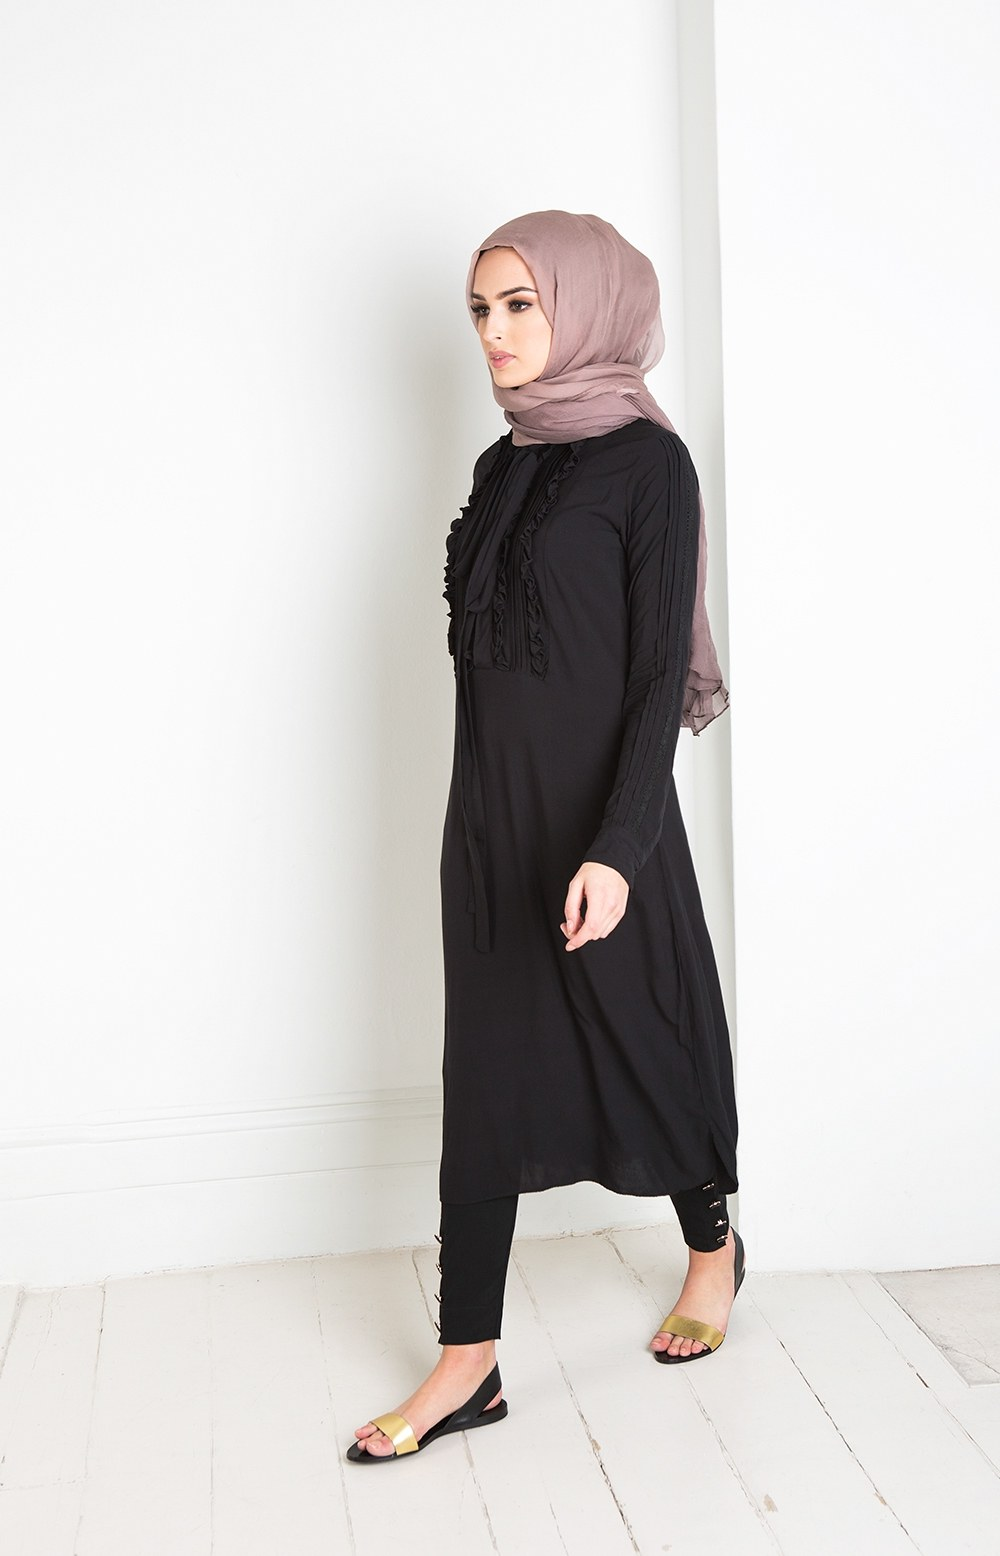 Ide Baju Lebaran Casual O2d5 25 Trend Model Baju Muslim Lebaran 2018 Simple & Modis